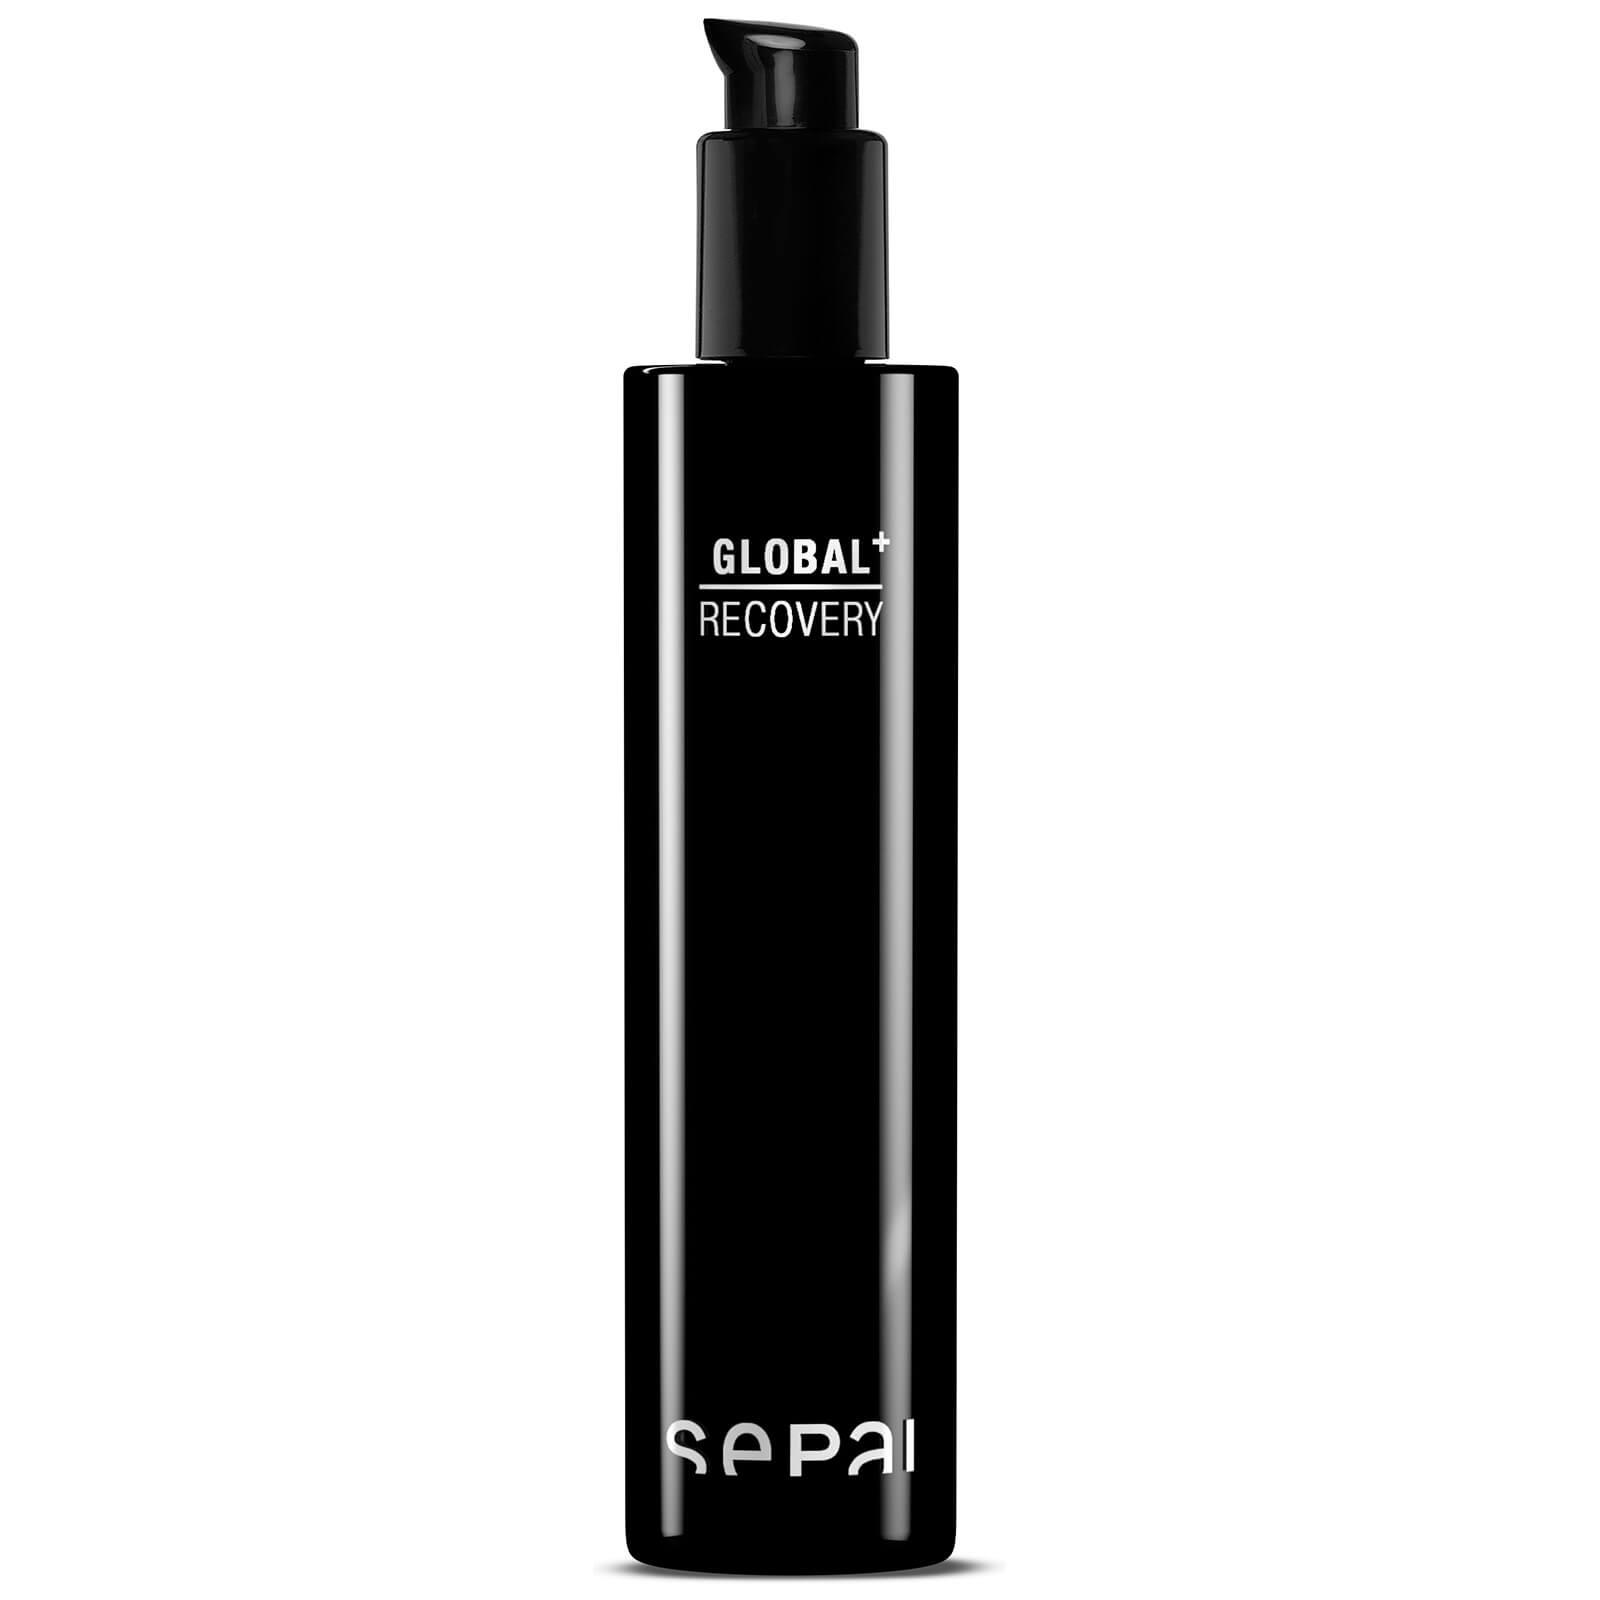 Купить Sepai Global+ Recovery Moisturiser 35g